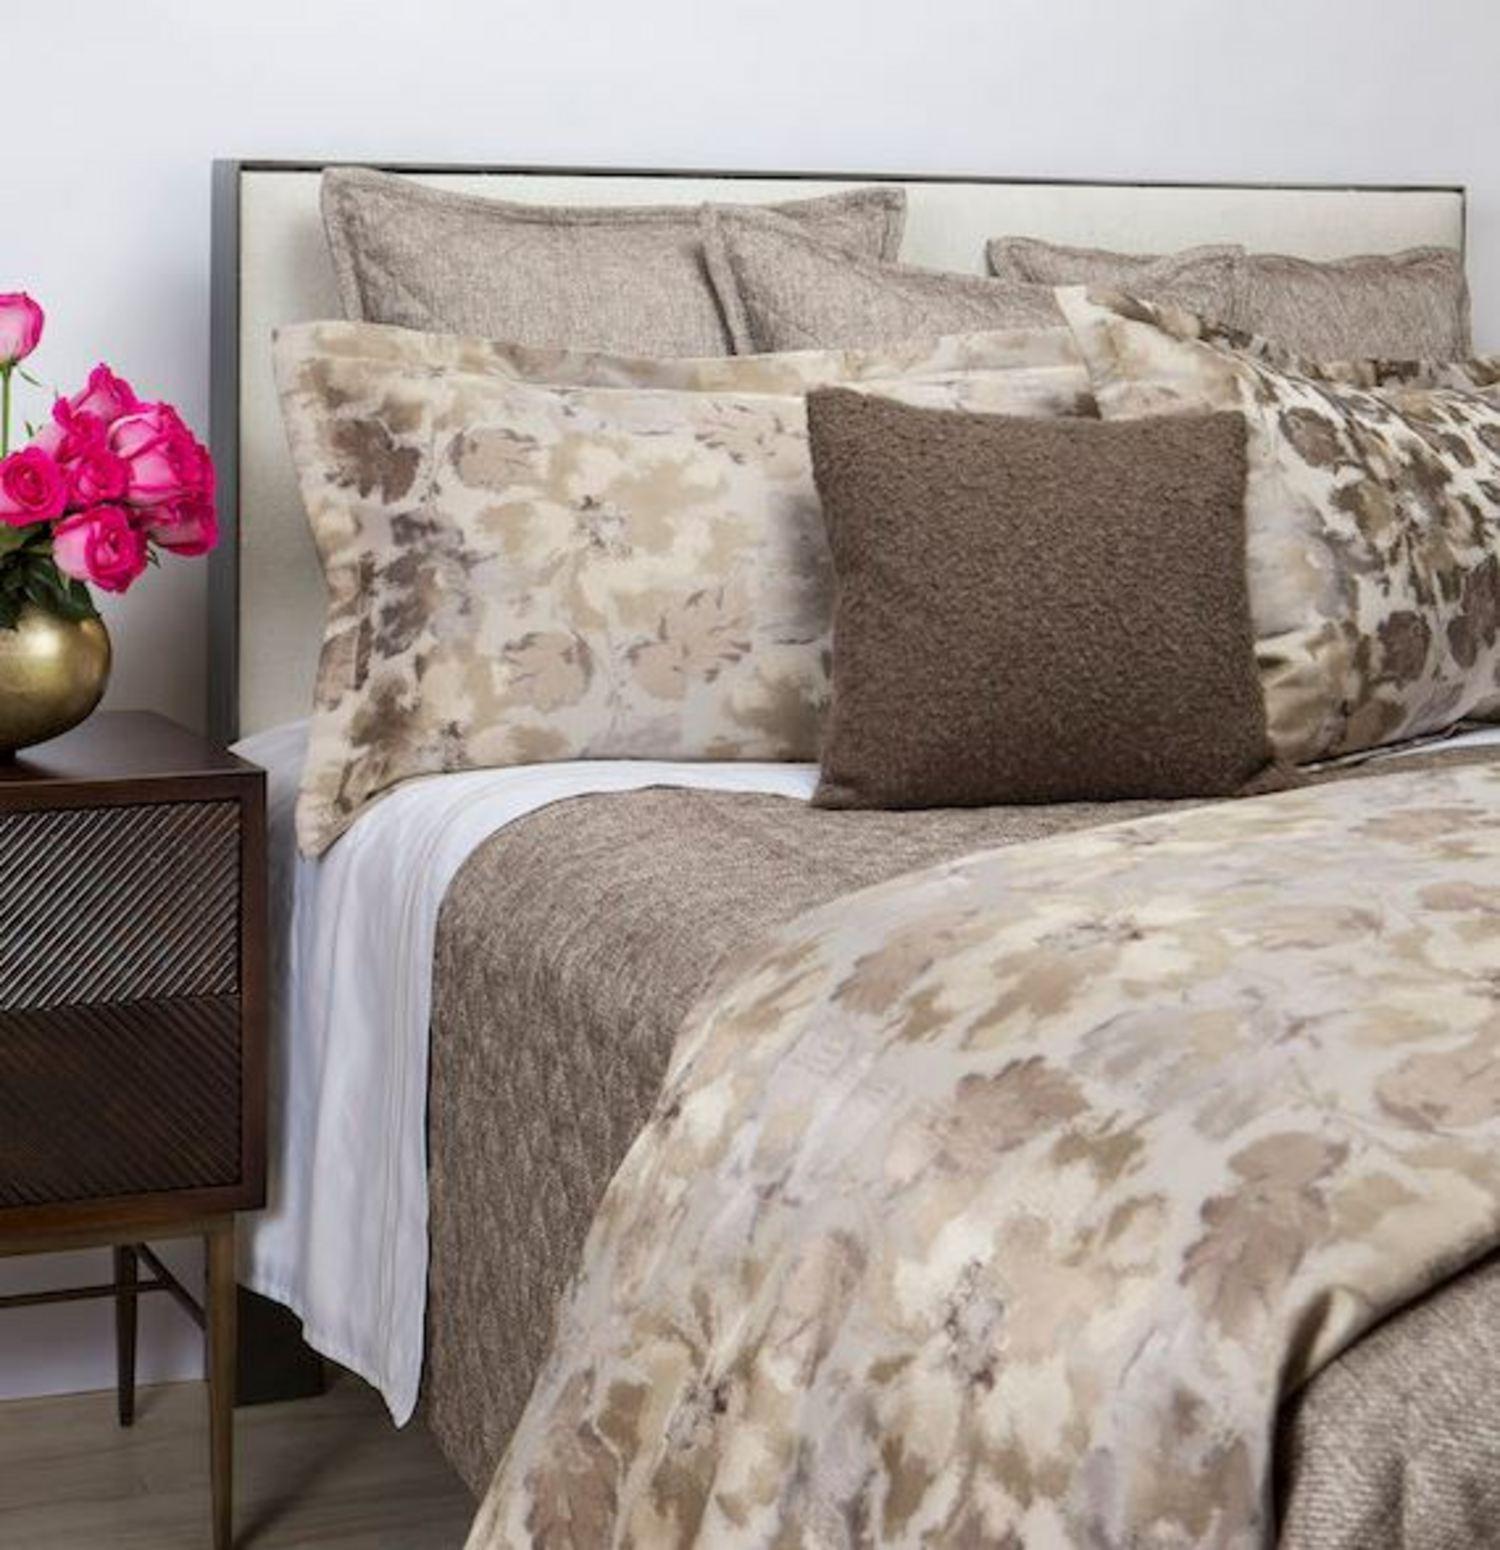 of and grey ideas vine fascinating duvet photo comforter decoration white includes comforters cover size flower full design beddinggrey images floral set bedding pink